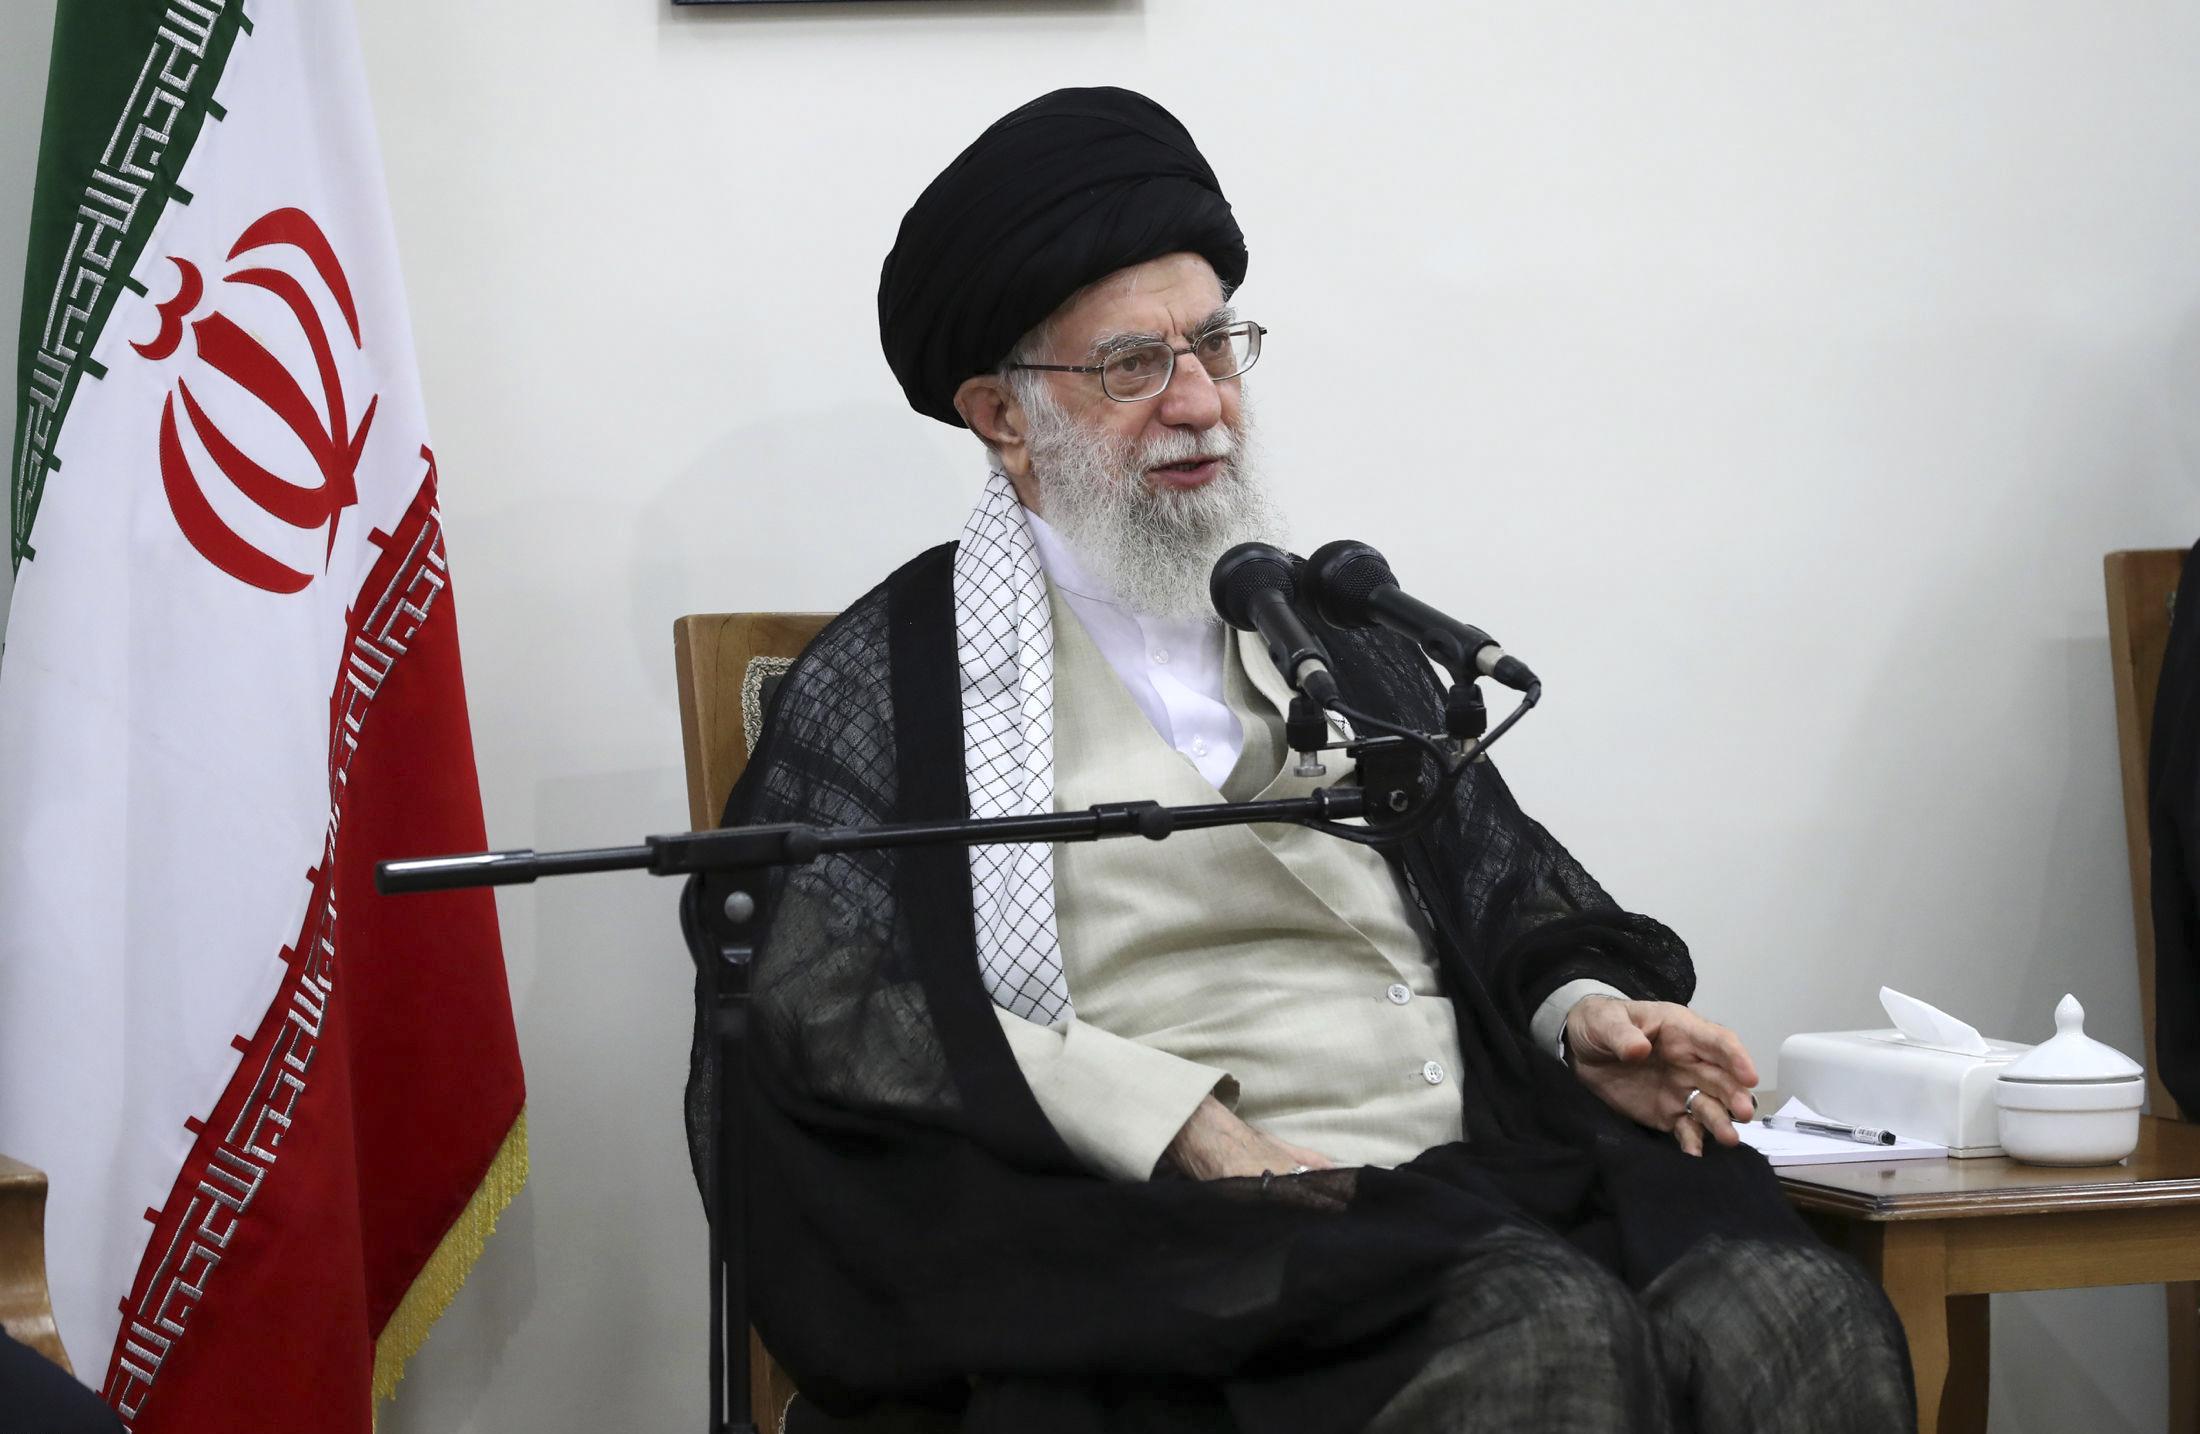 Key Senate Democrat says U.S. pressure on Iran is 'producing a reaction'